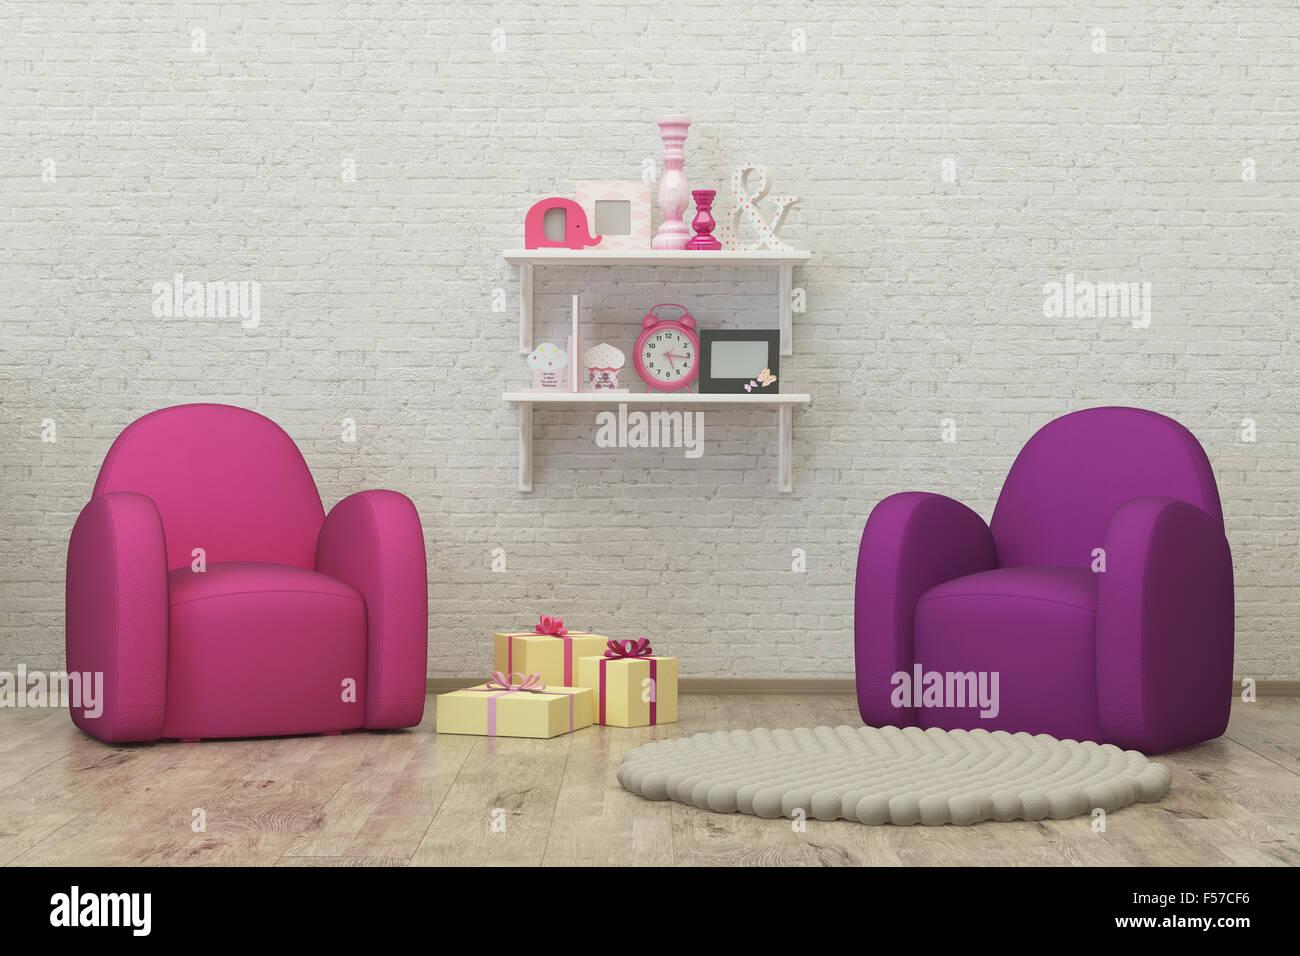 Sala infantil interior 3D Render imagen, pouf, presenta Imagen De Stock